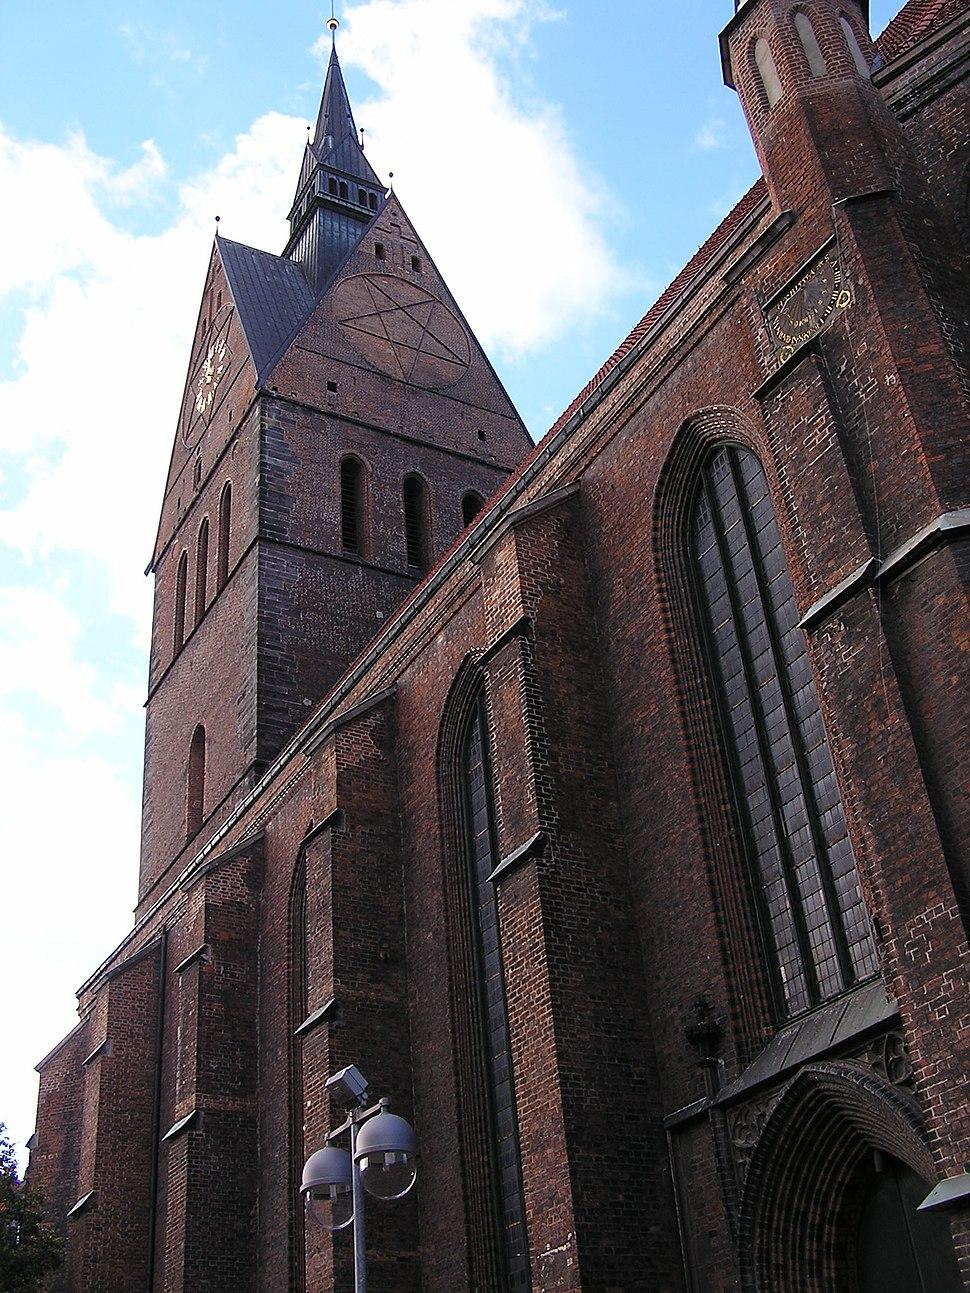 HanoverMarktkirche